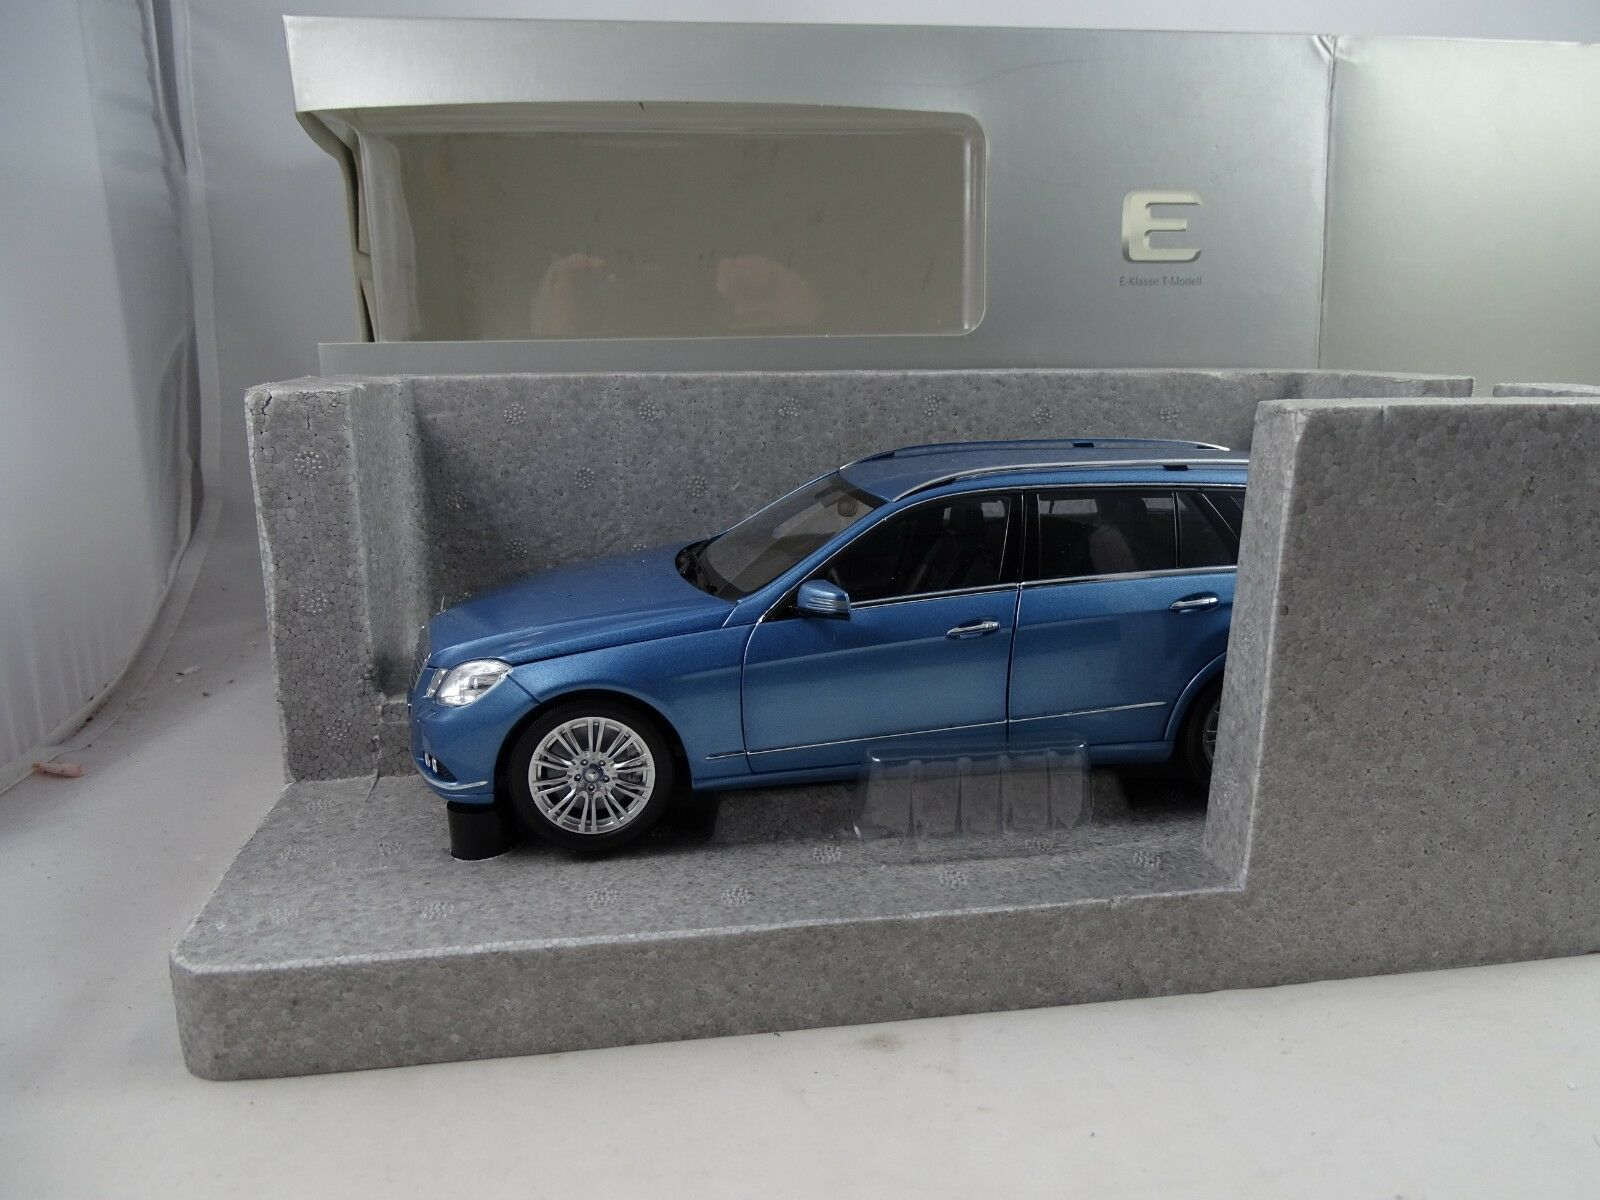 oferta de tienda 1 18 18 18 museo modelo  b66962449 mercedes-benz T-modelo plata azul-rareza §  tienda en linea